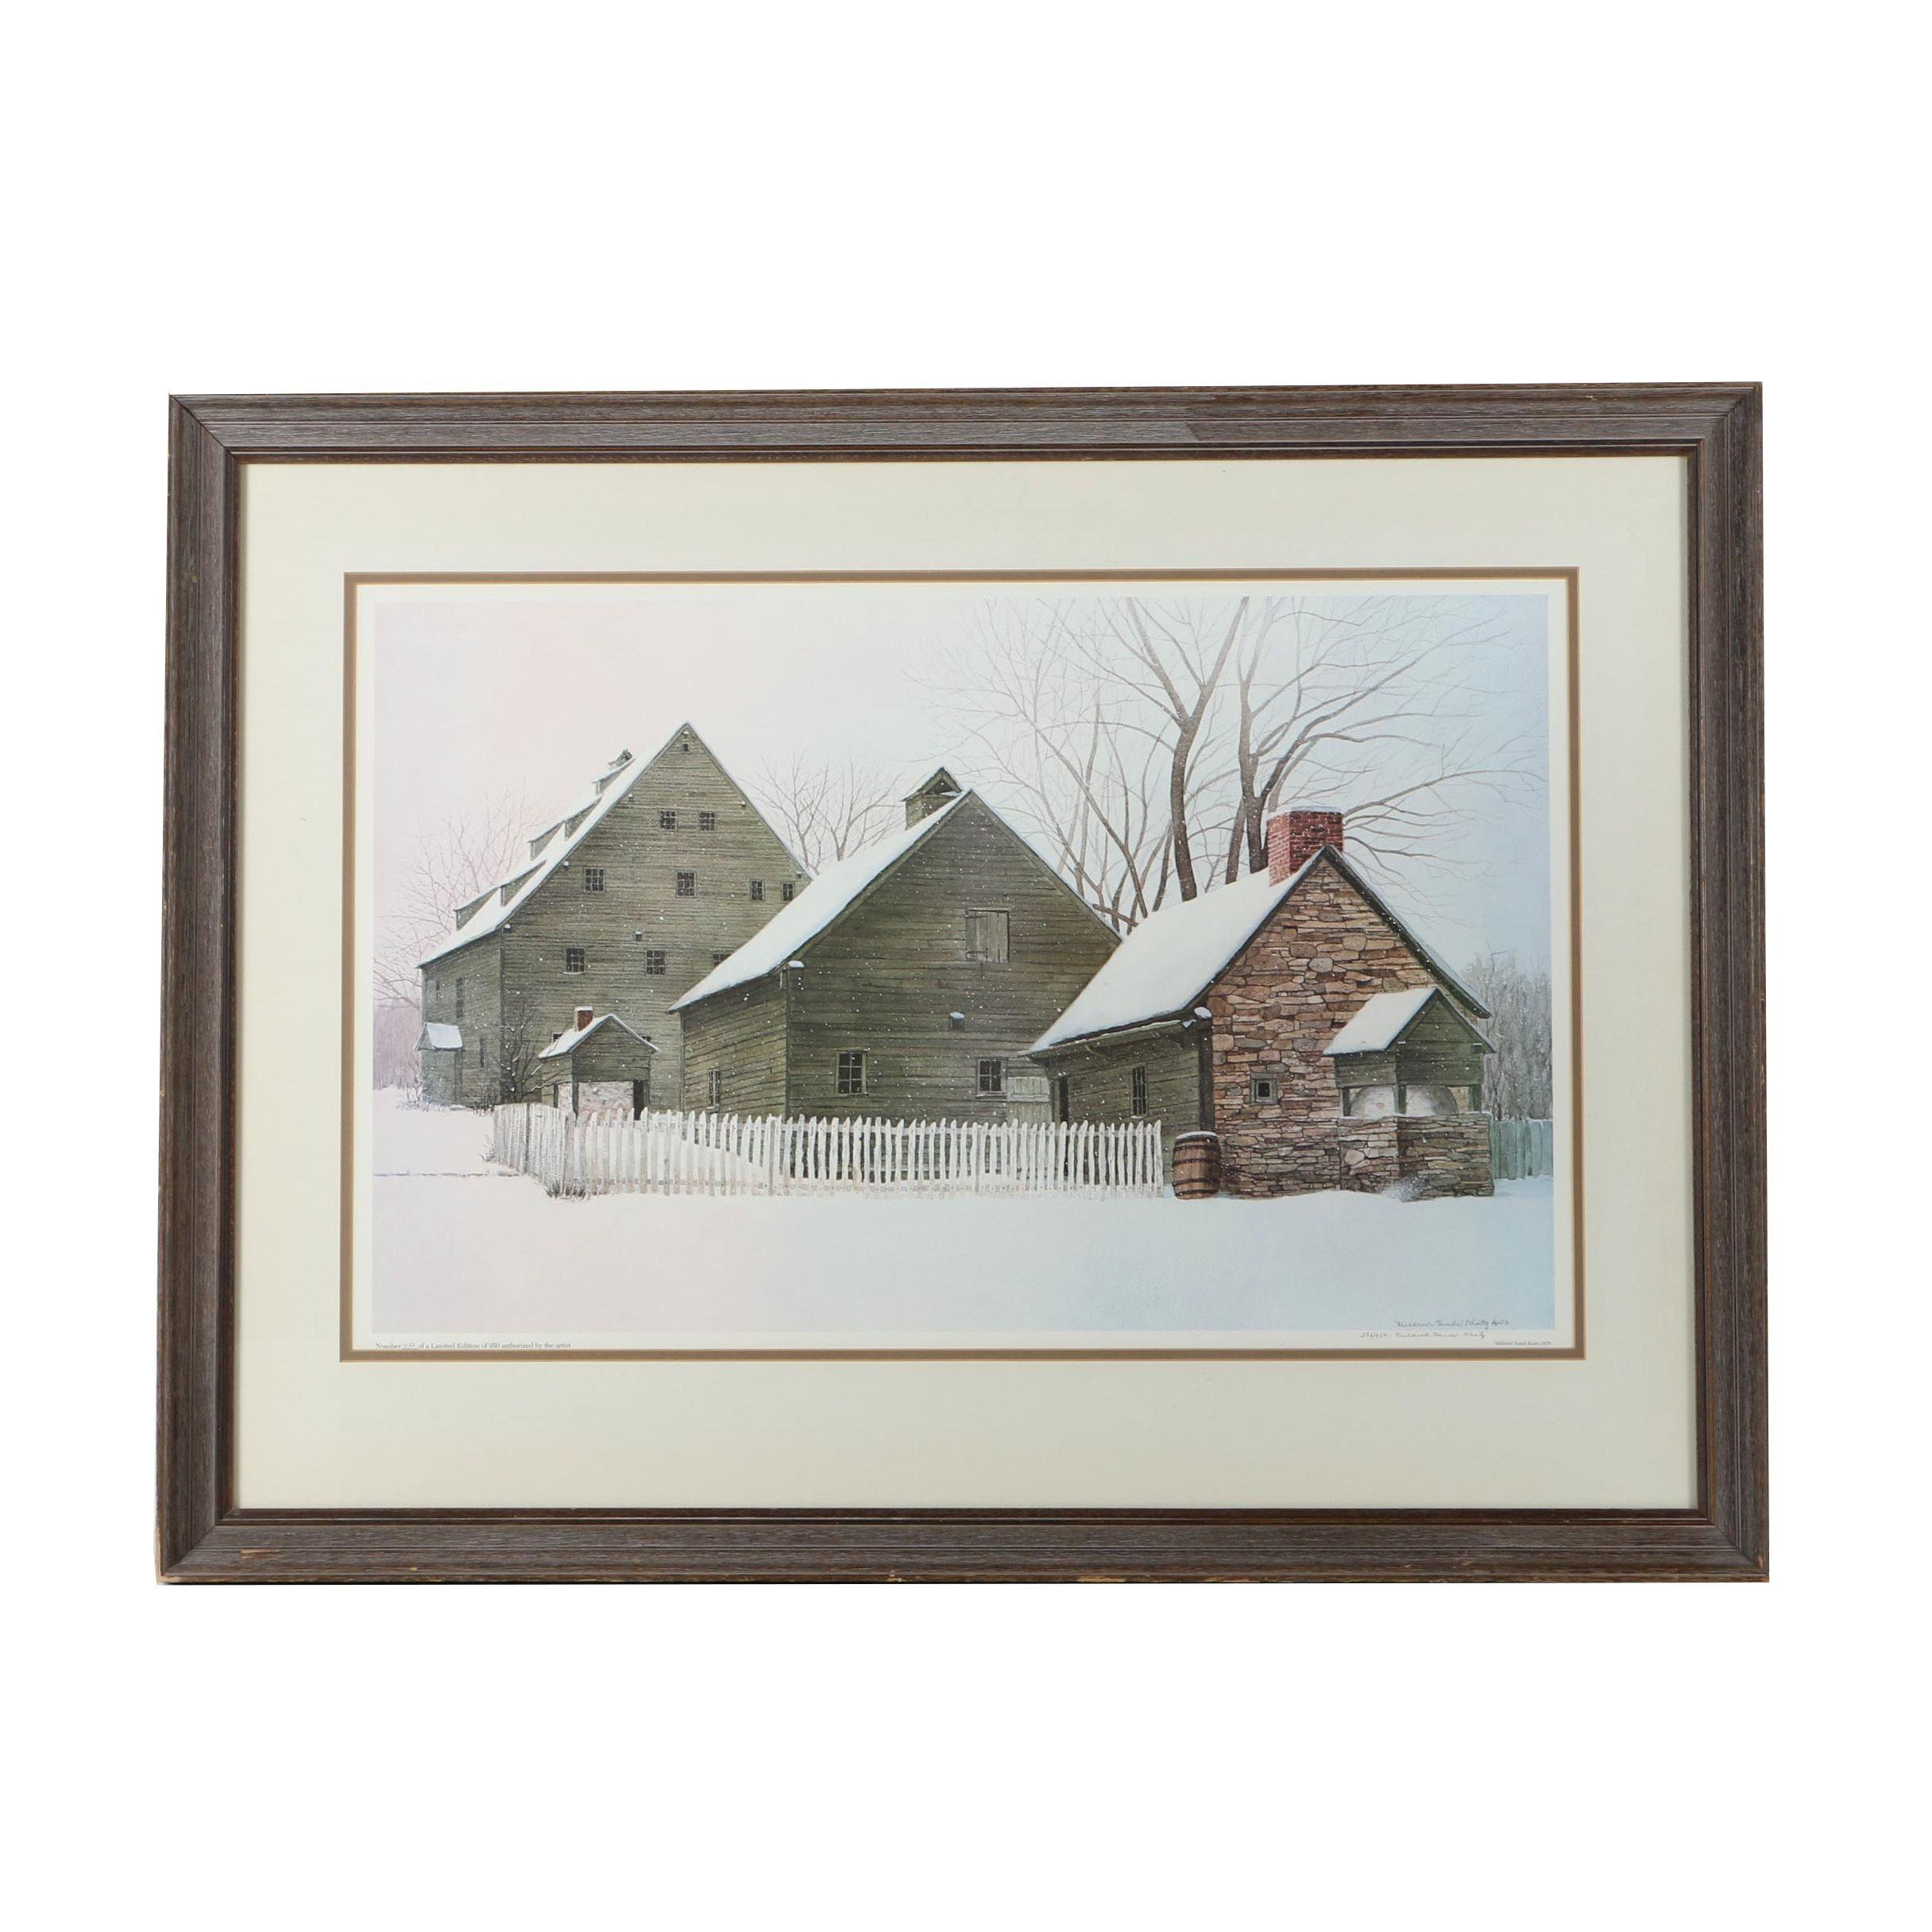 Mildred Sands Kratz 1978 Limited Edition Print of Barns in Winter Landscape